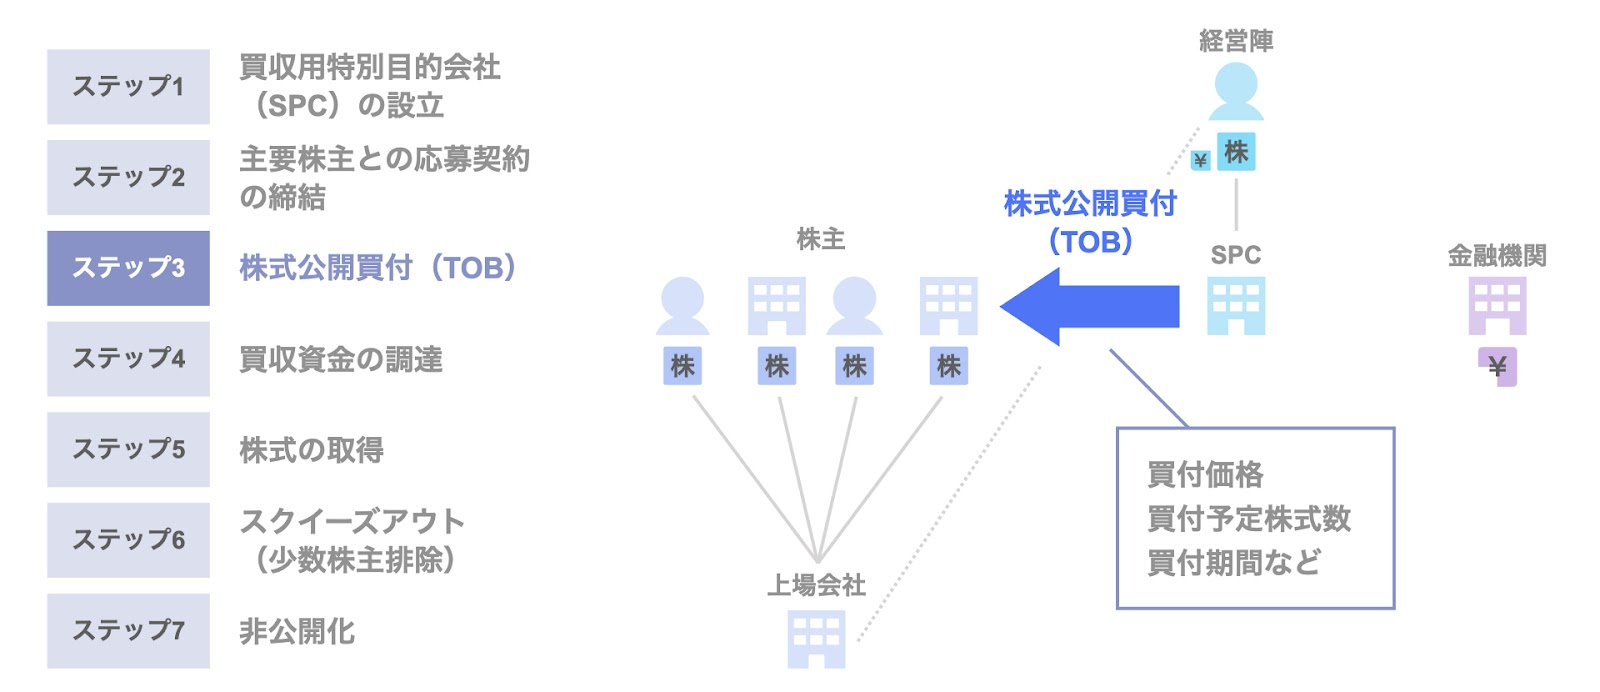 MBOによる非公開化のスキーム③株式公開買付(TOB)